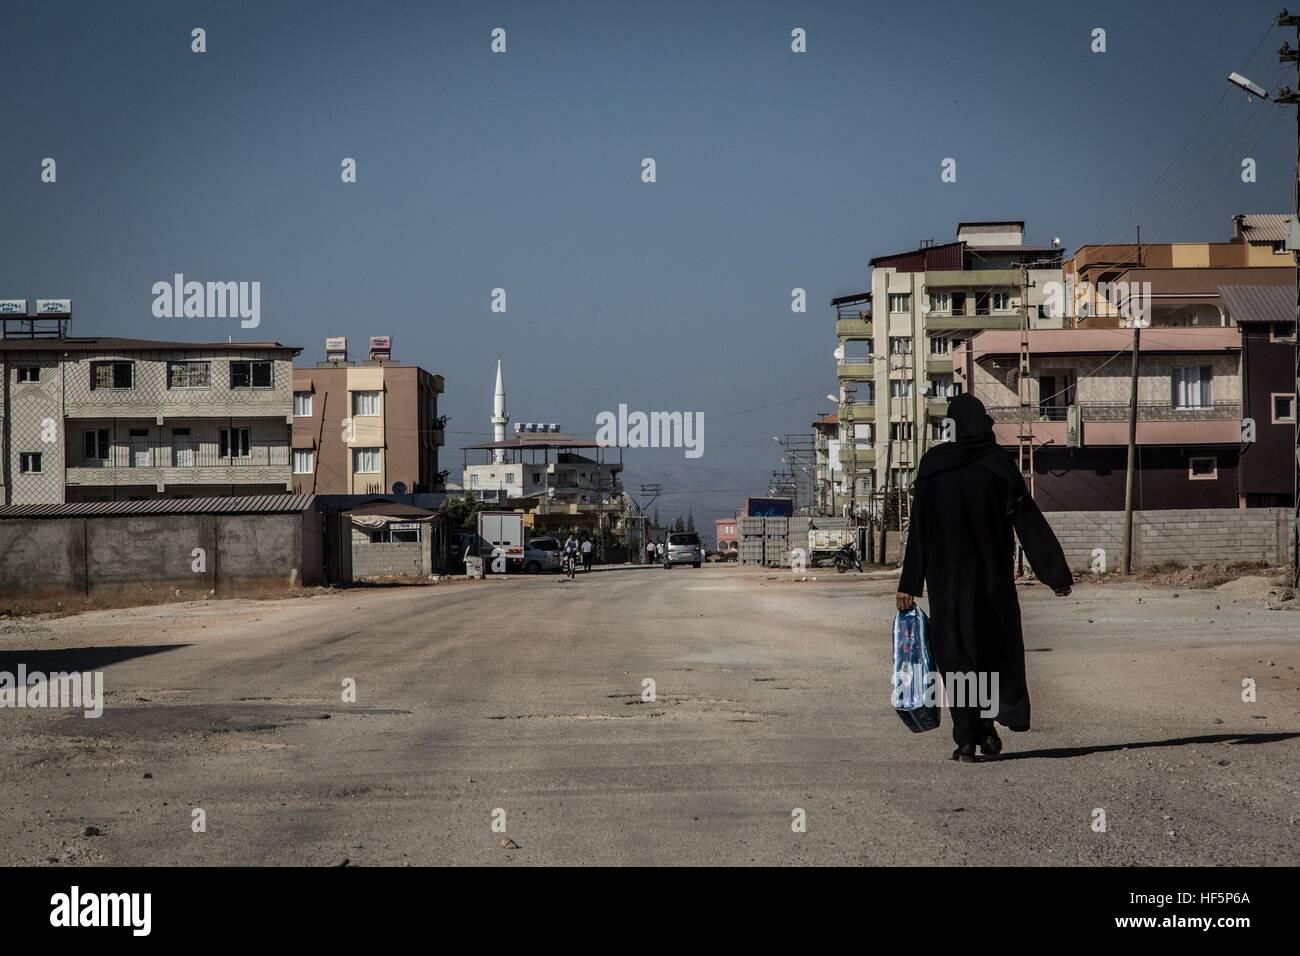 Turkey - Reyhanli - Smugglers' Town -  22/09/2015  -  Turkey / Hatay / Reyhanli  -  A veiled woman walks along main Stock Photo